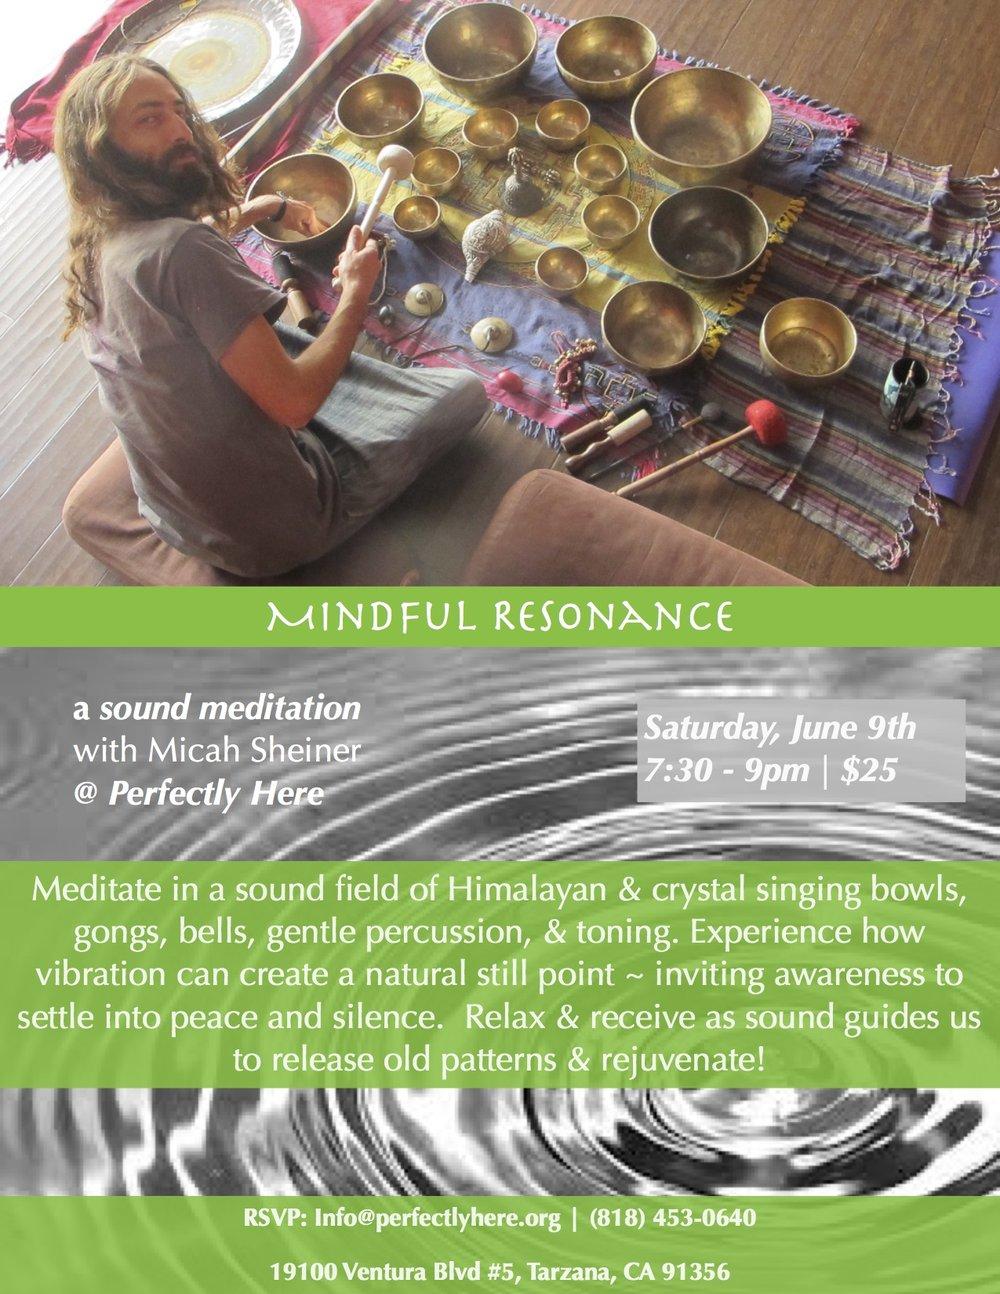 mindful resonance 5.jpg